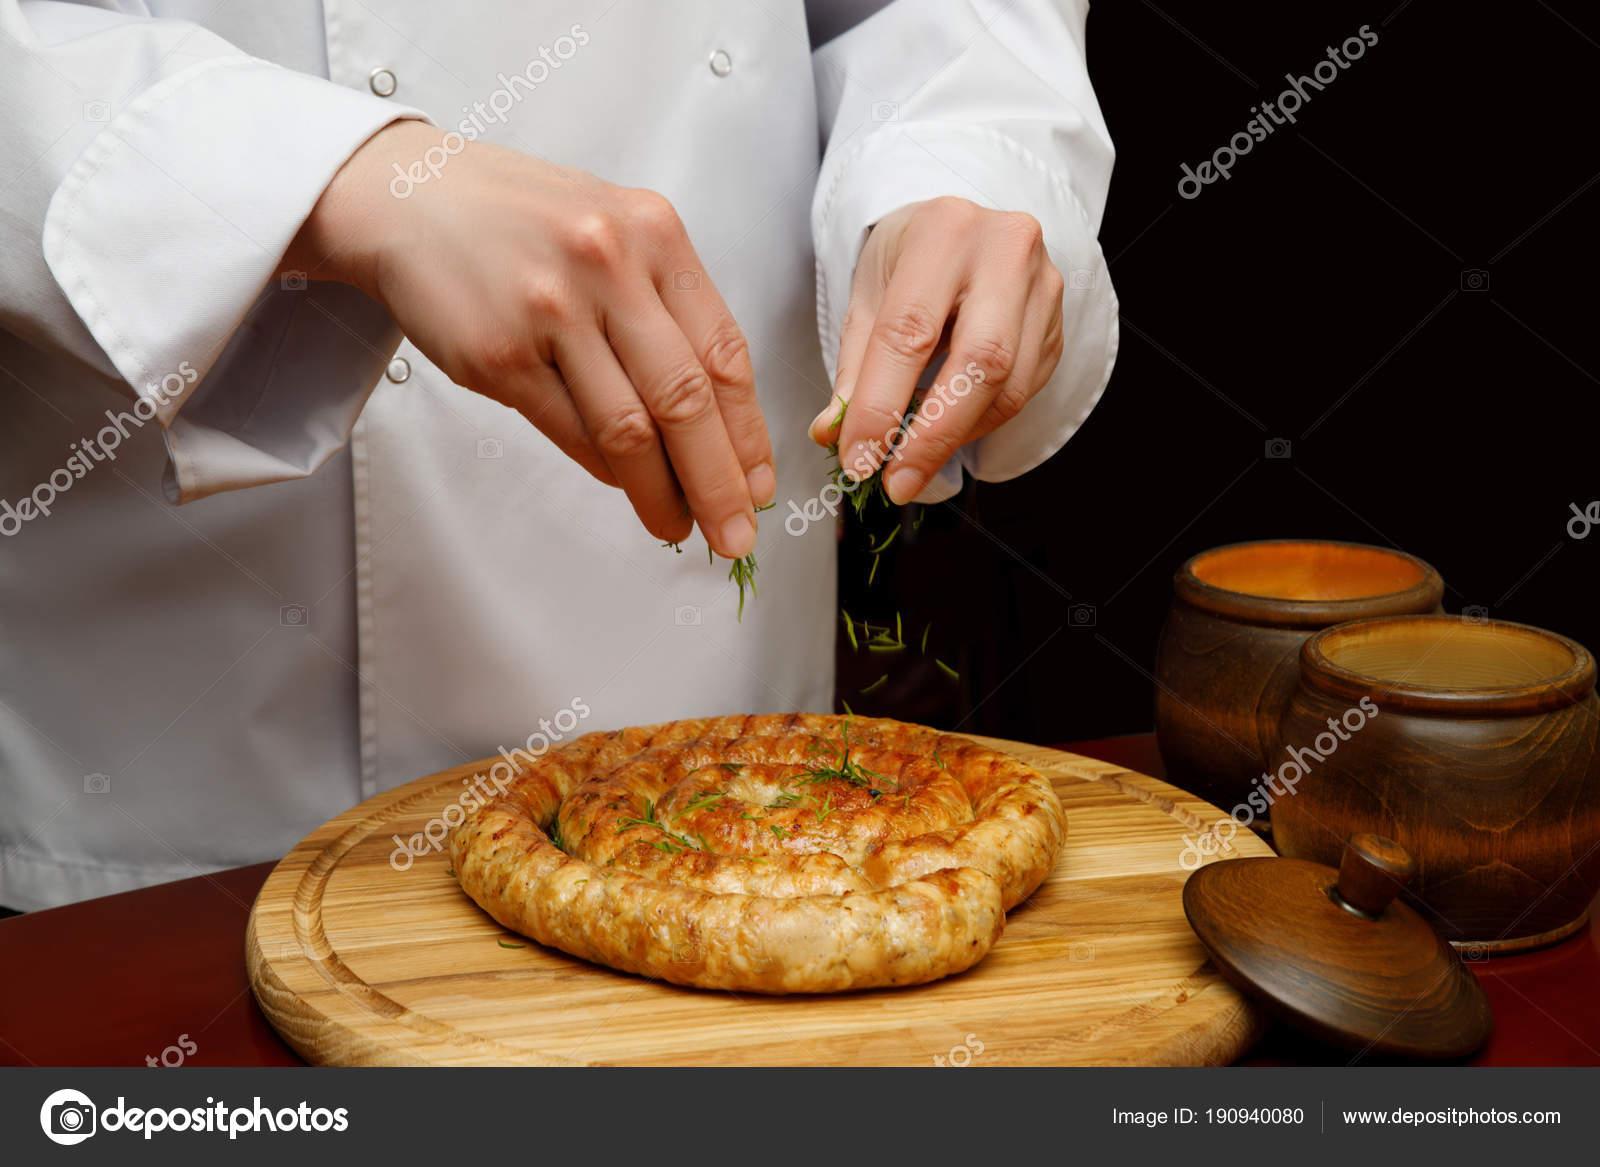 Cook sprinkle homemade sausage seasoning .– stock image